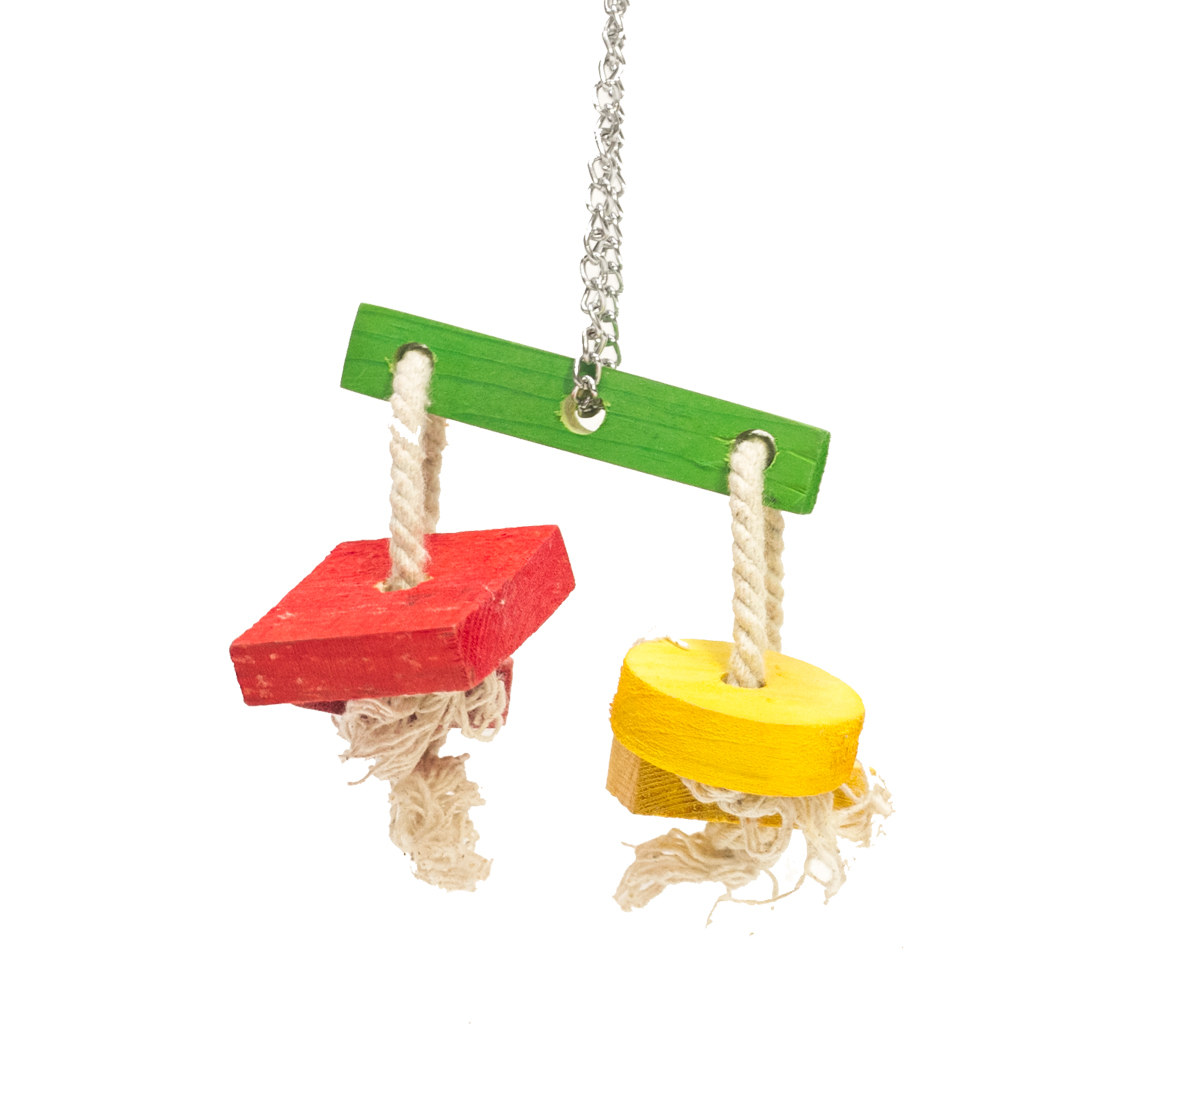 Bird Toy Outlet : Birdspot see saw hanging bird toy dogspot online pet